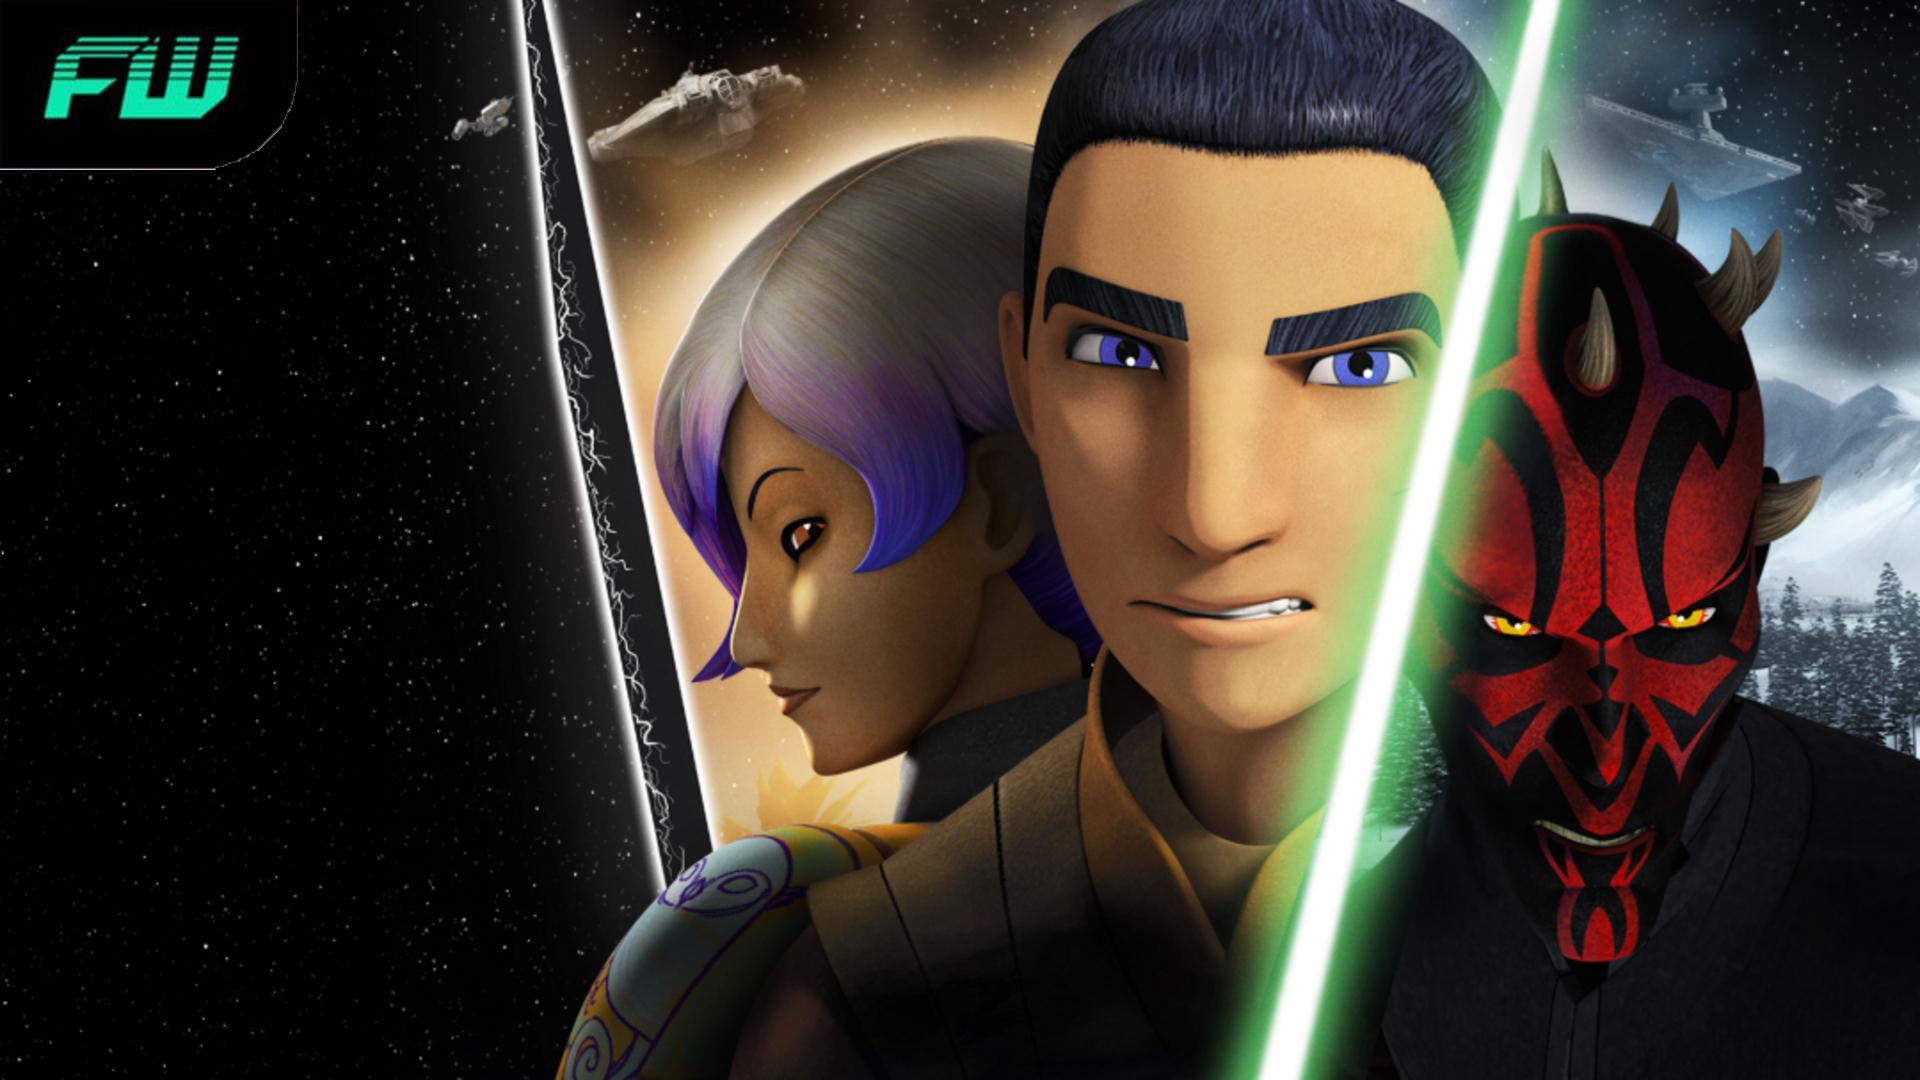 Rumor Star Wars Rebels Sequel In The Works Fandomwire